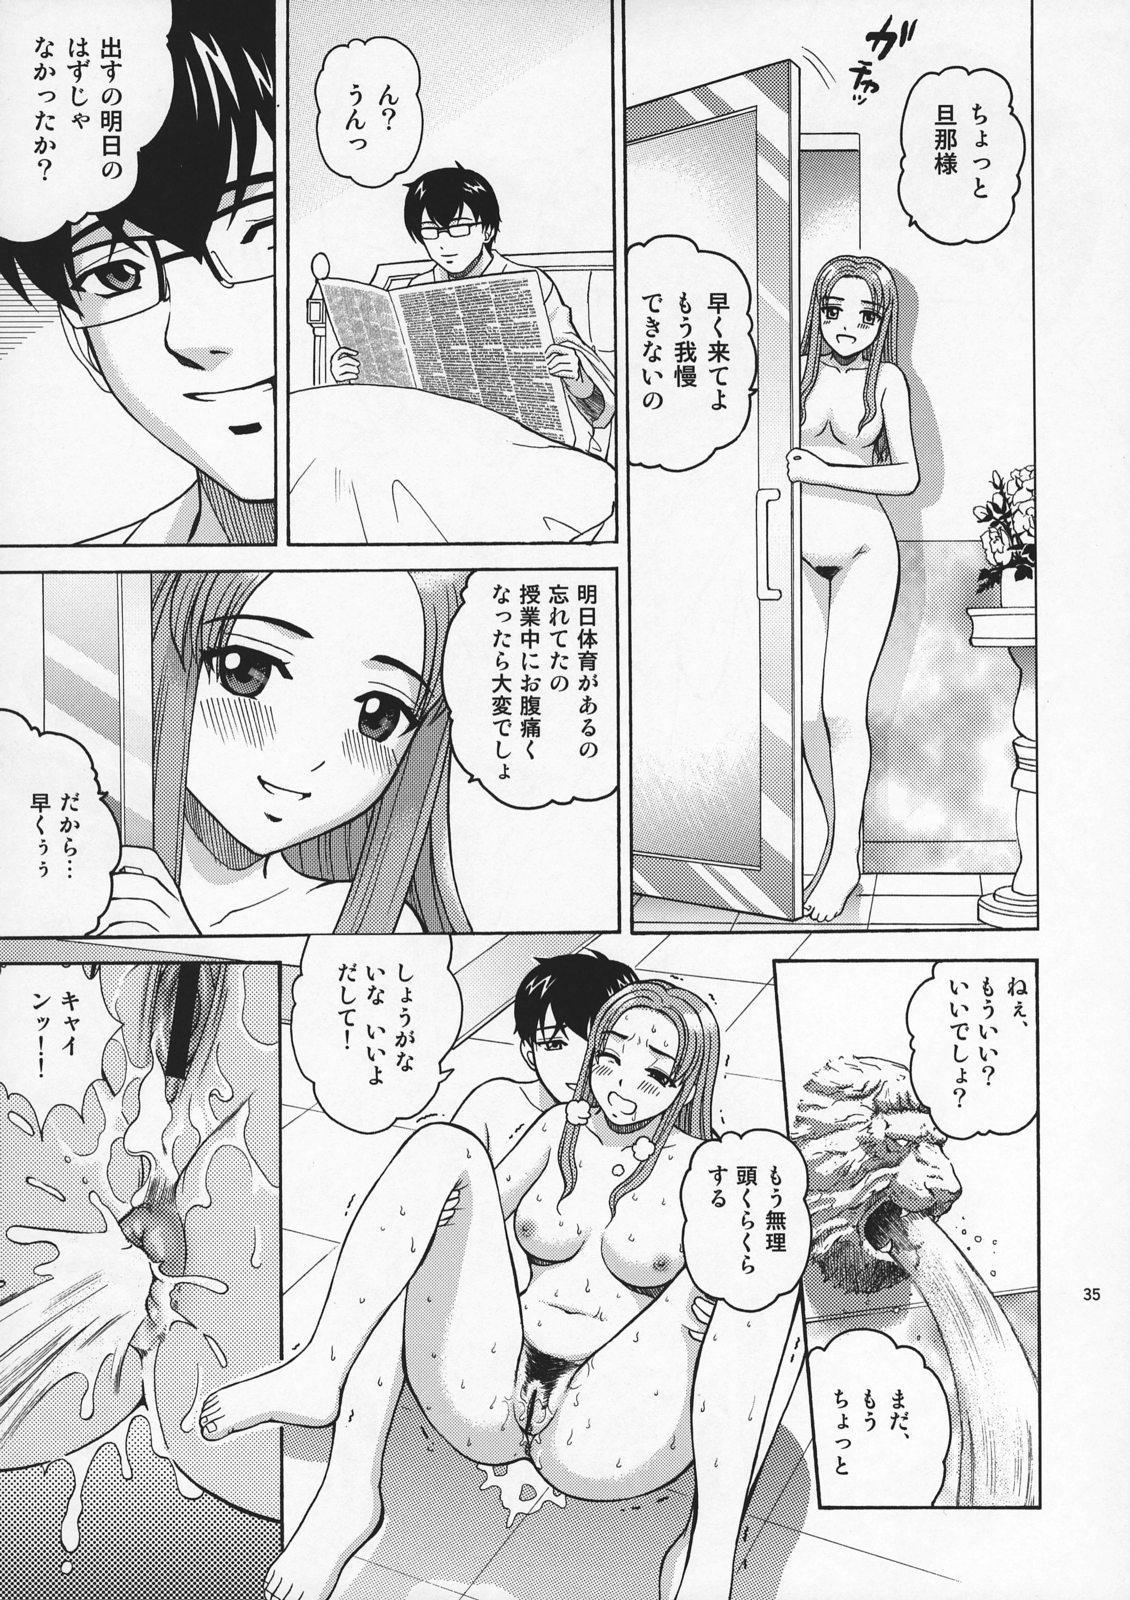 (C72) [Cool Brain (Kitani Sai)] ANGEL PAIN Extra 4 -Ojou-sama Scatology- 33